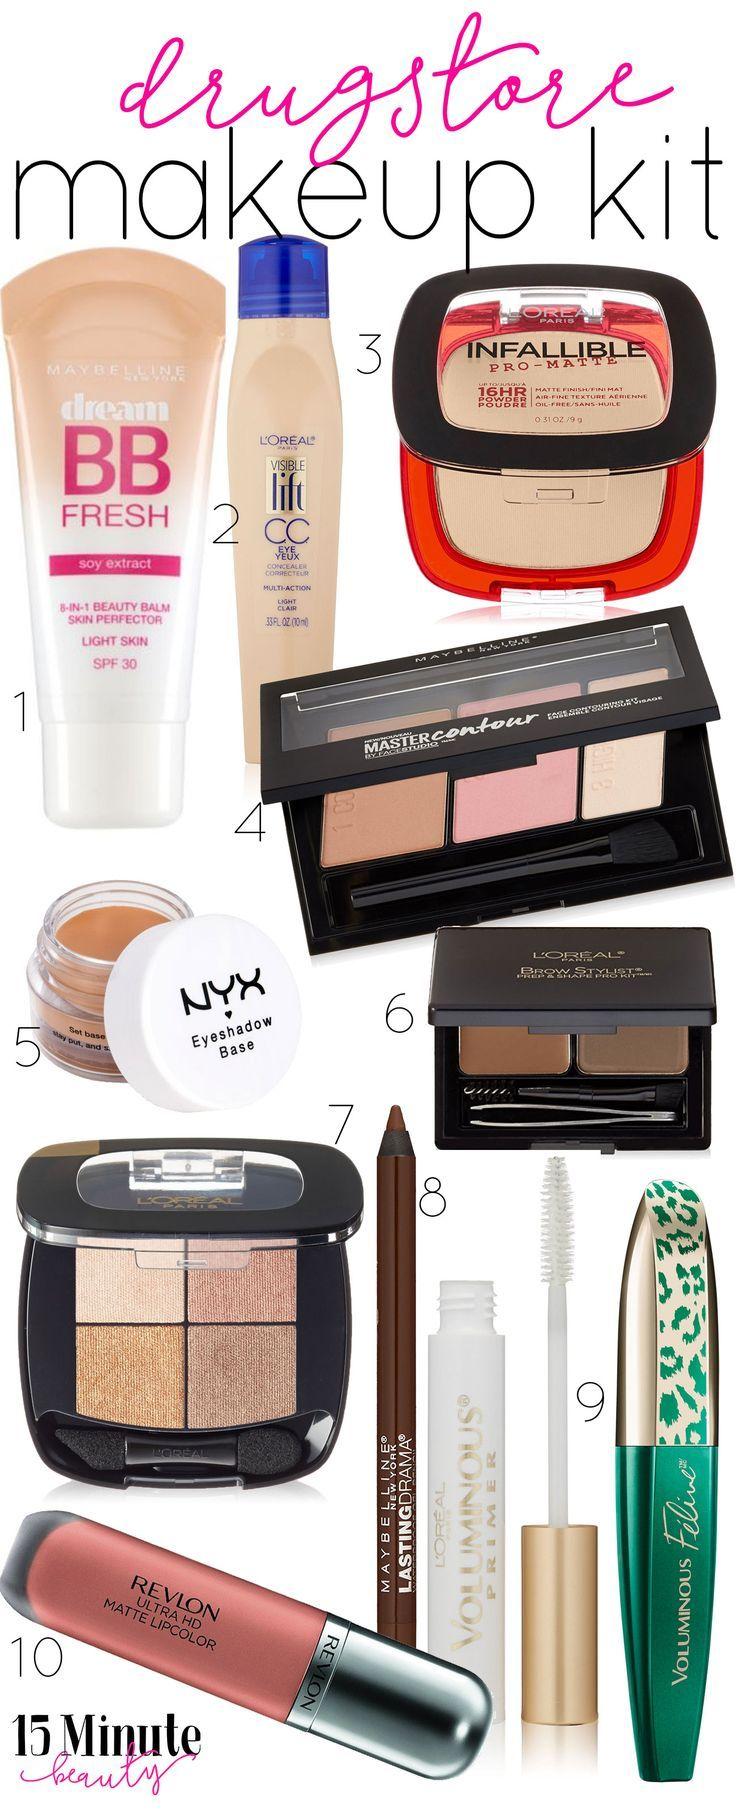 The Drugstore Makeup Kit: My Picks